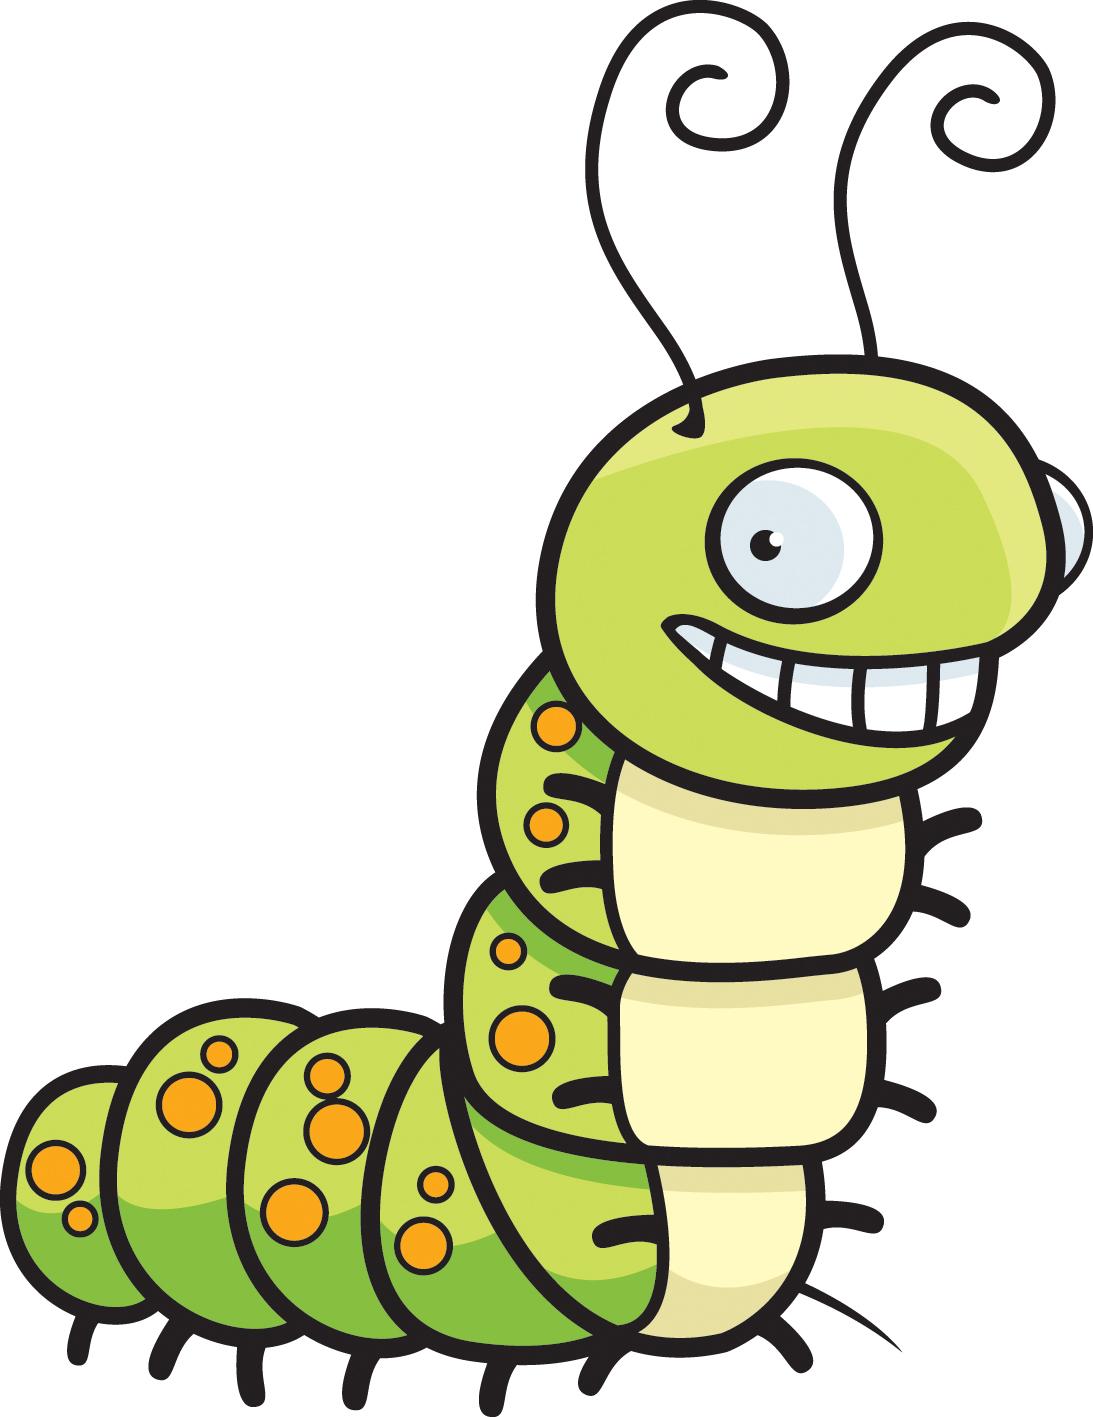 Caterpillar clipart poem, Caterpillar poem Transparent FREE.